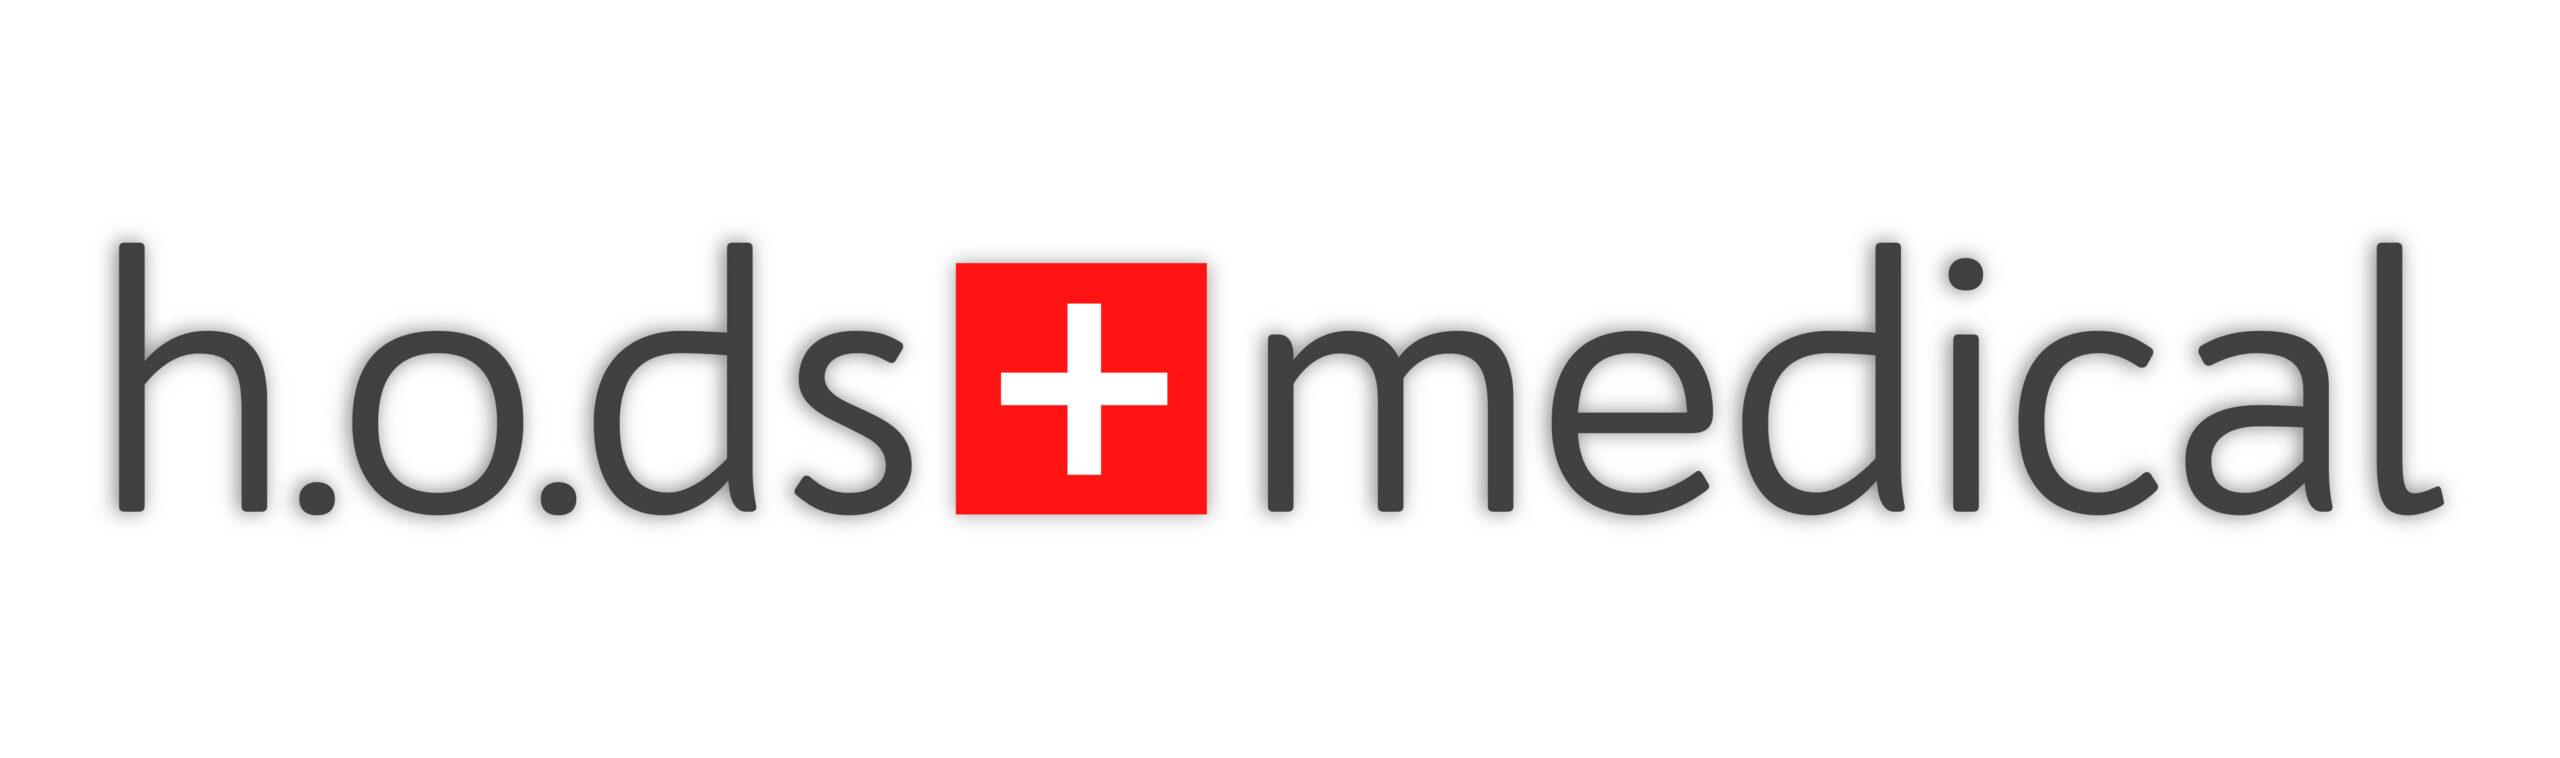 Hods Medical AB